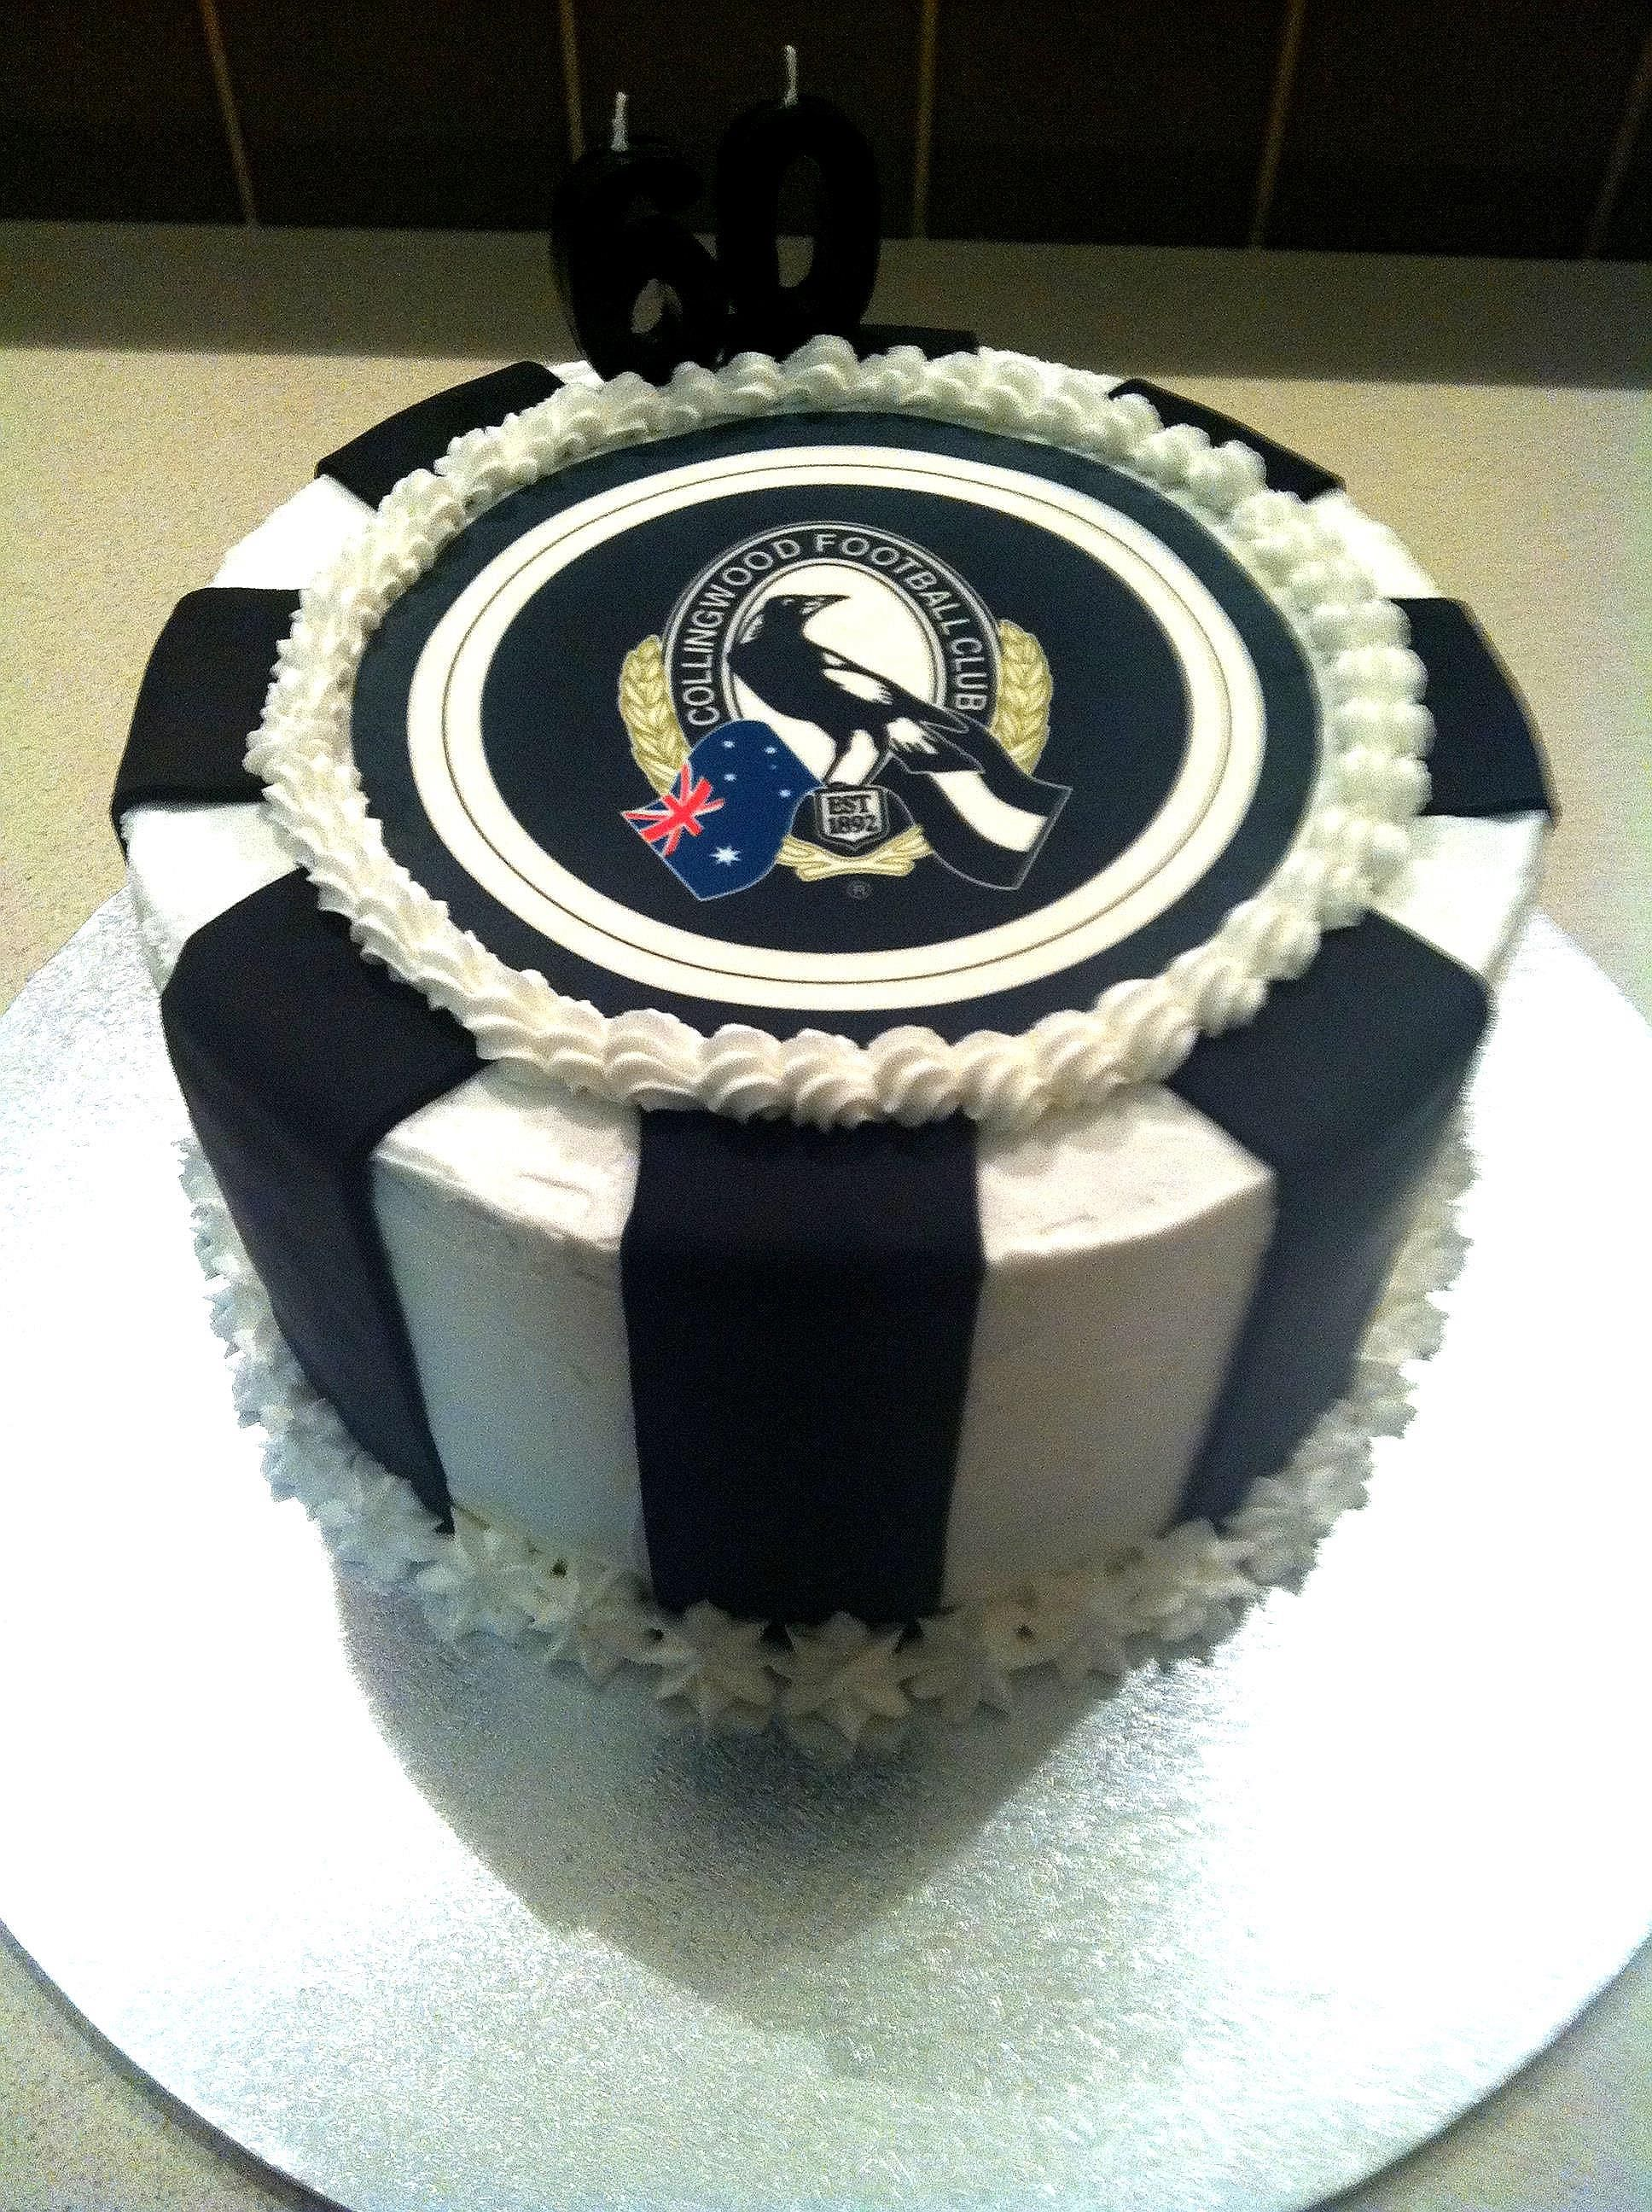 Afl collingwood cake mrs b cakes pinterest cakes